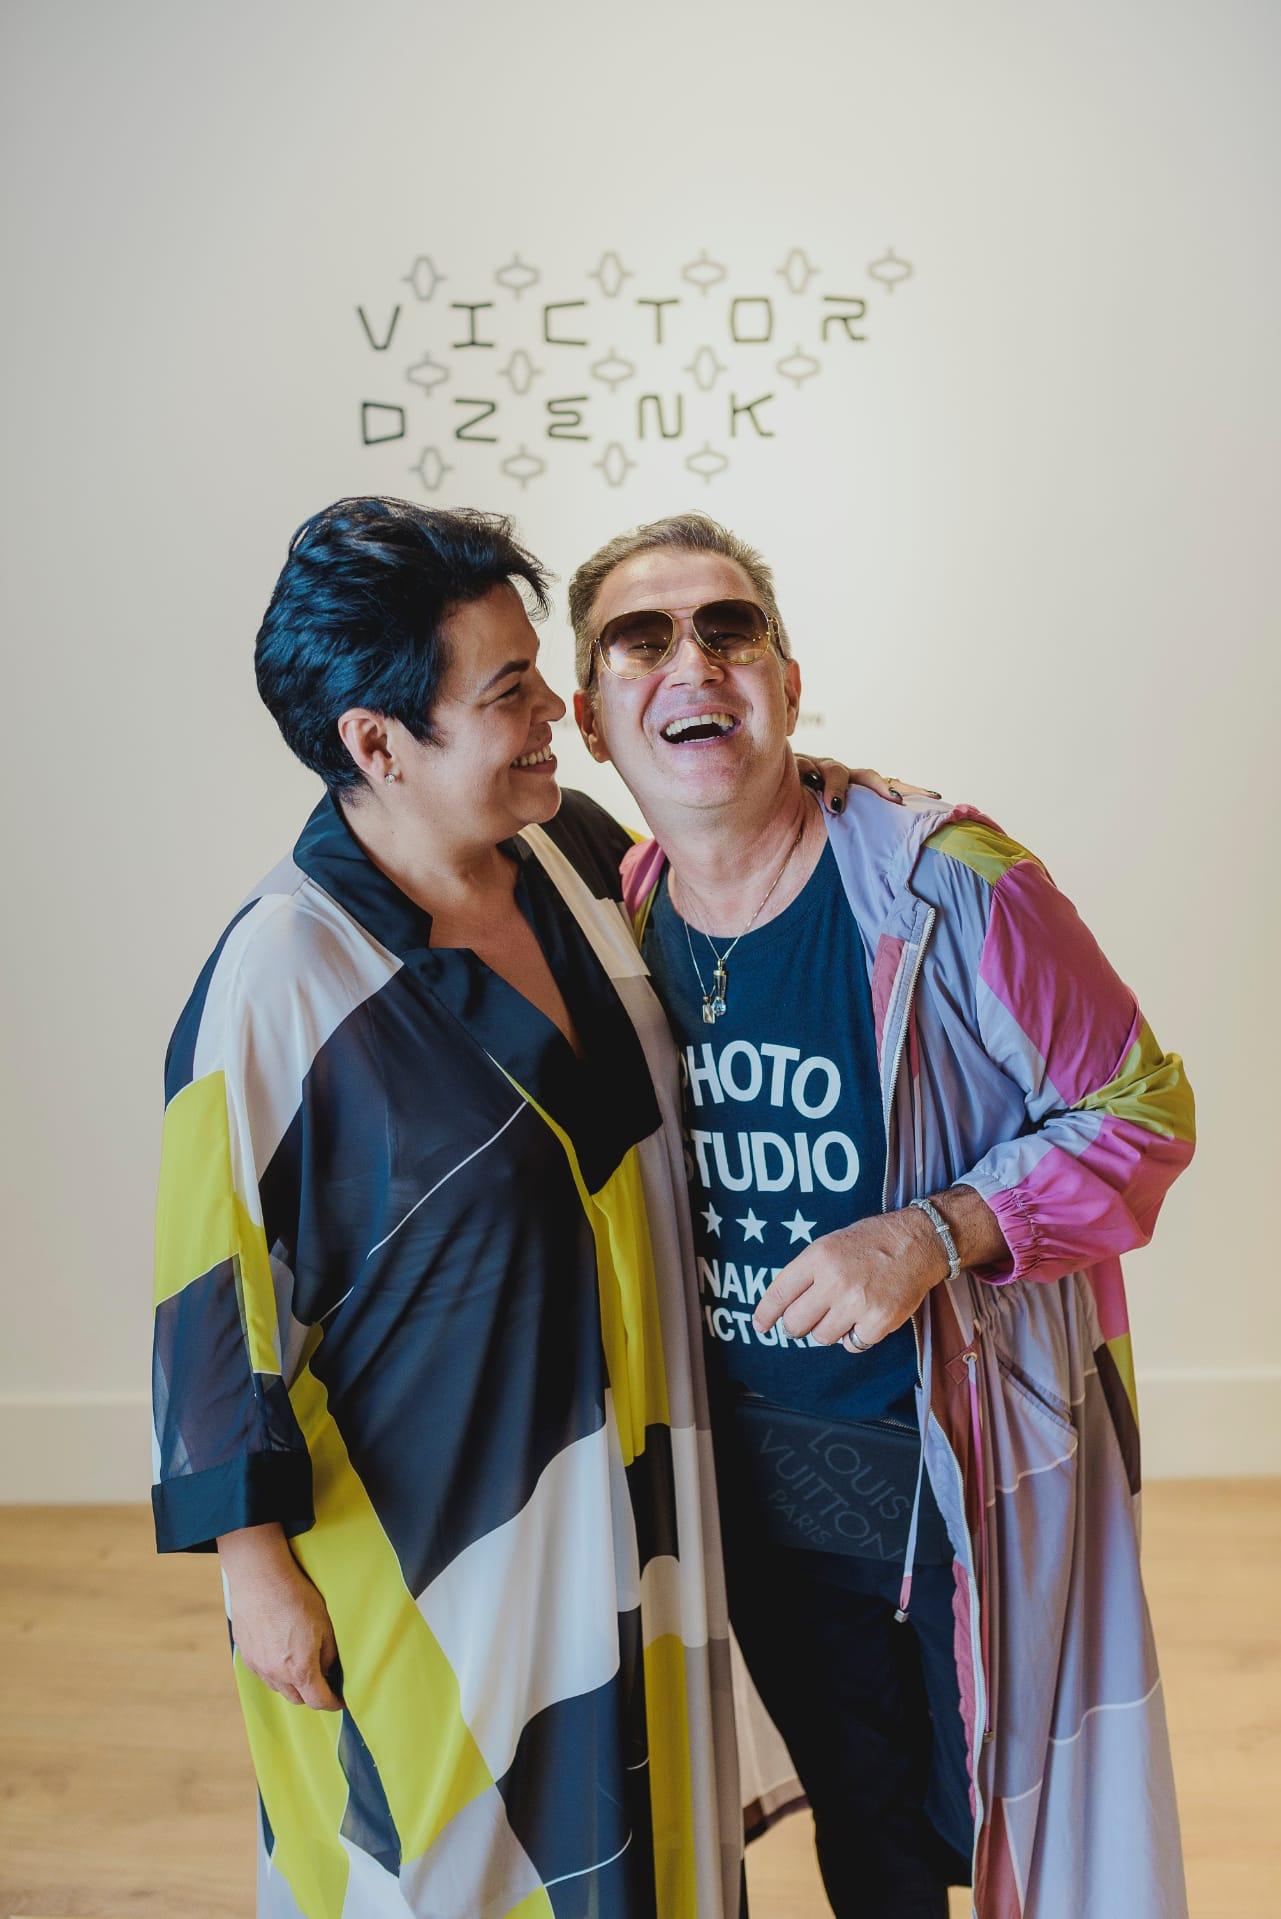 Andrea Guerra, proprietária da Primner, e Victor Dzenk